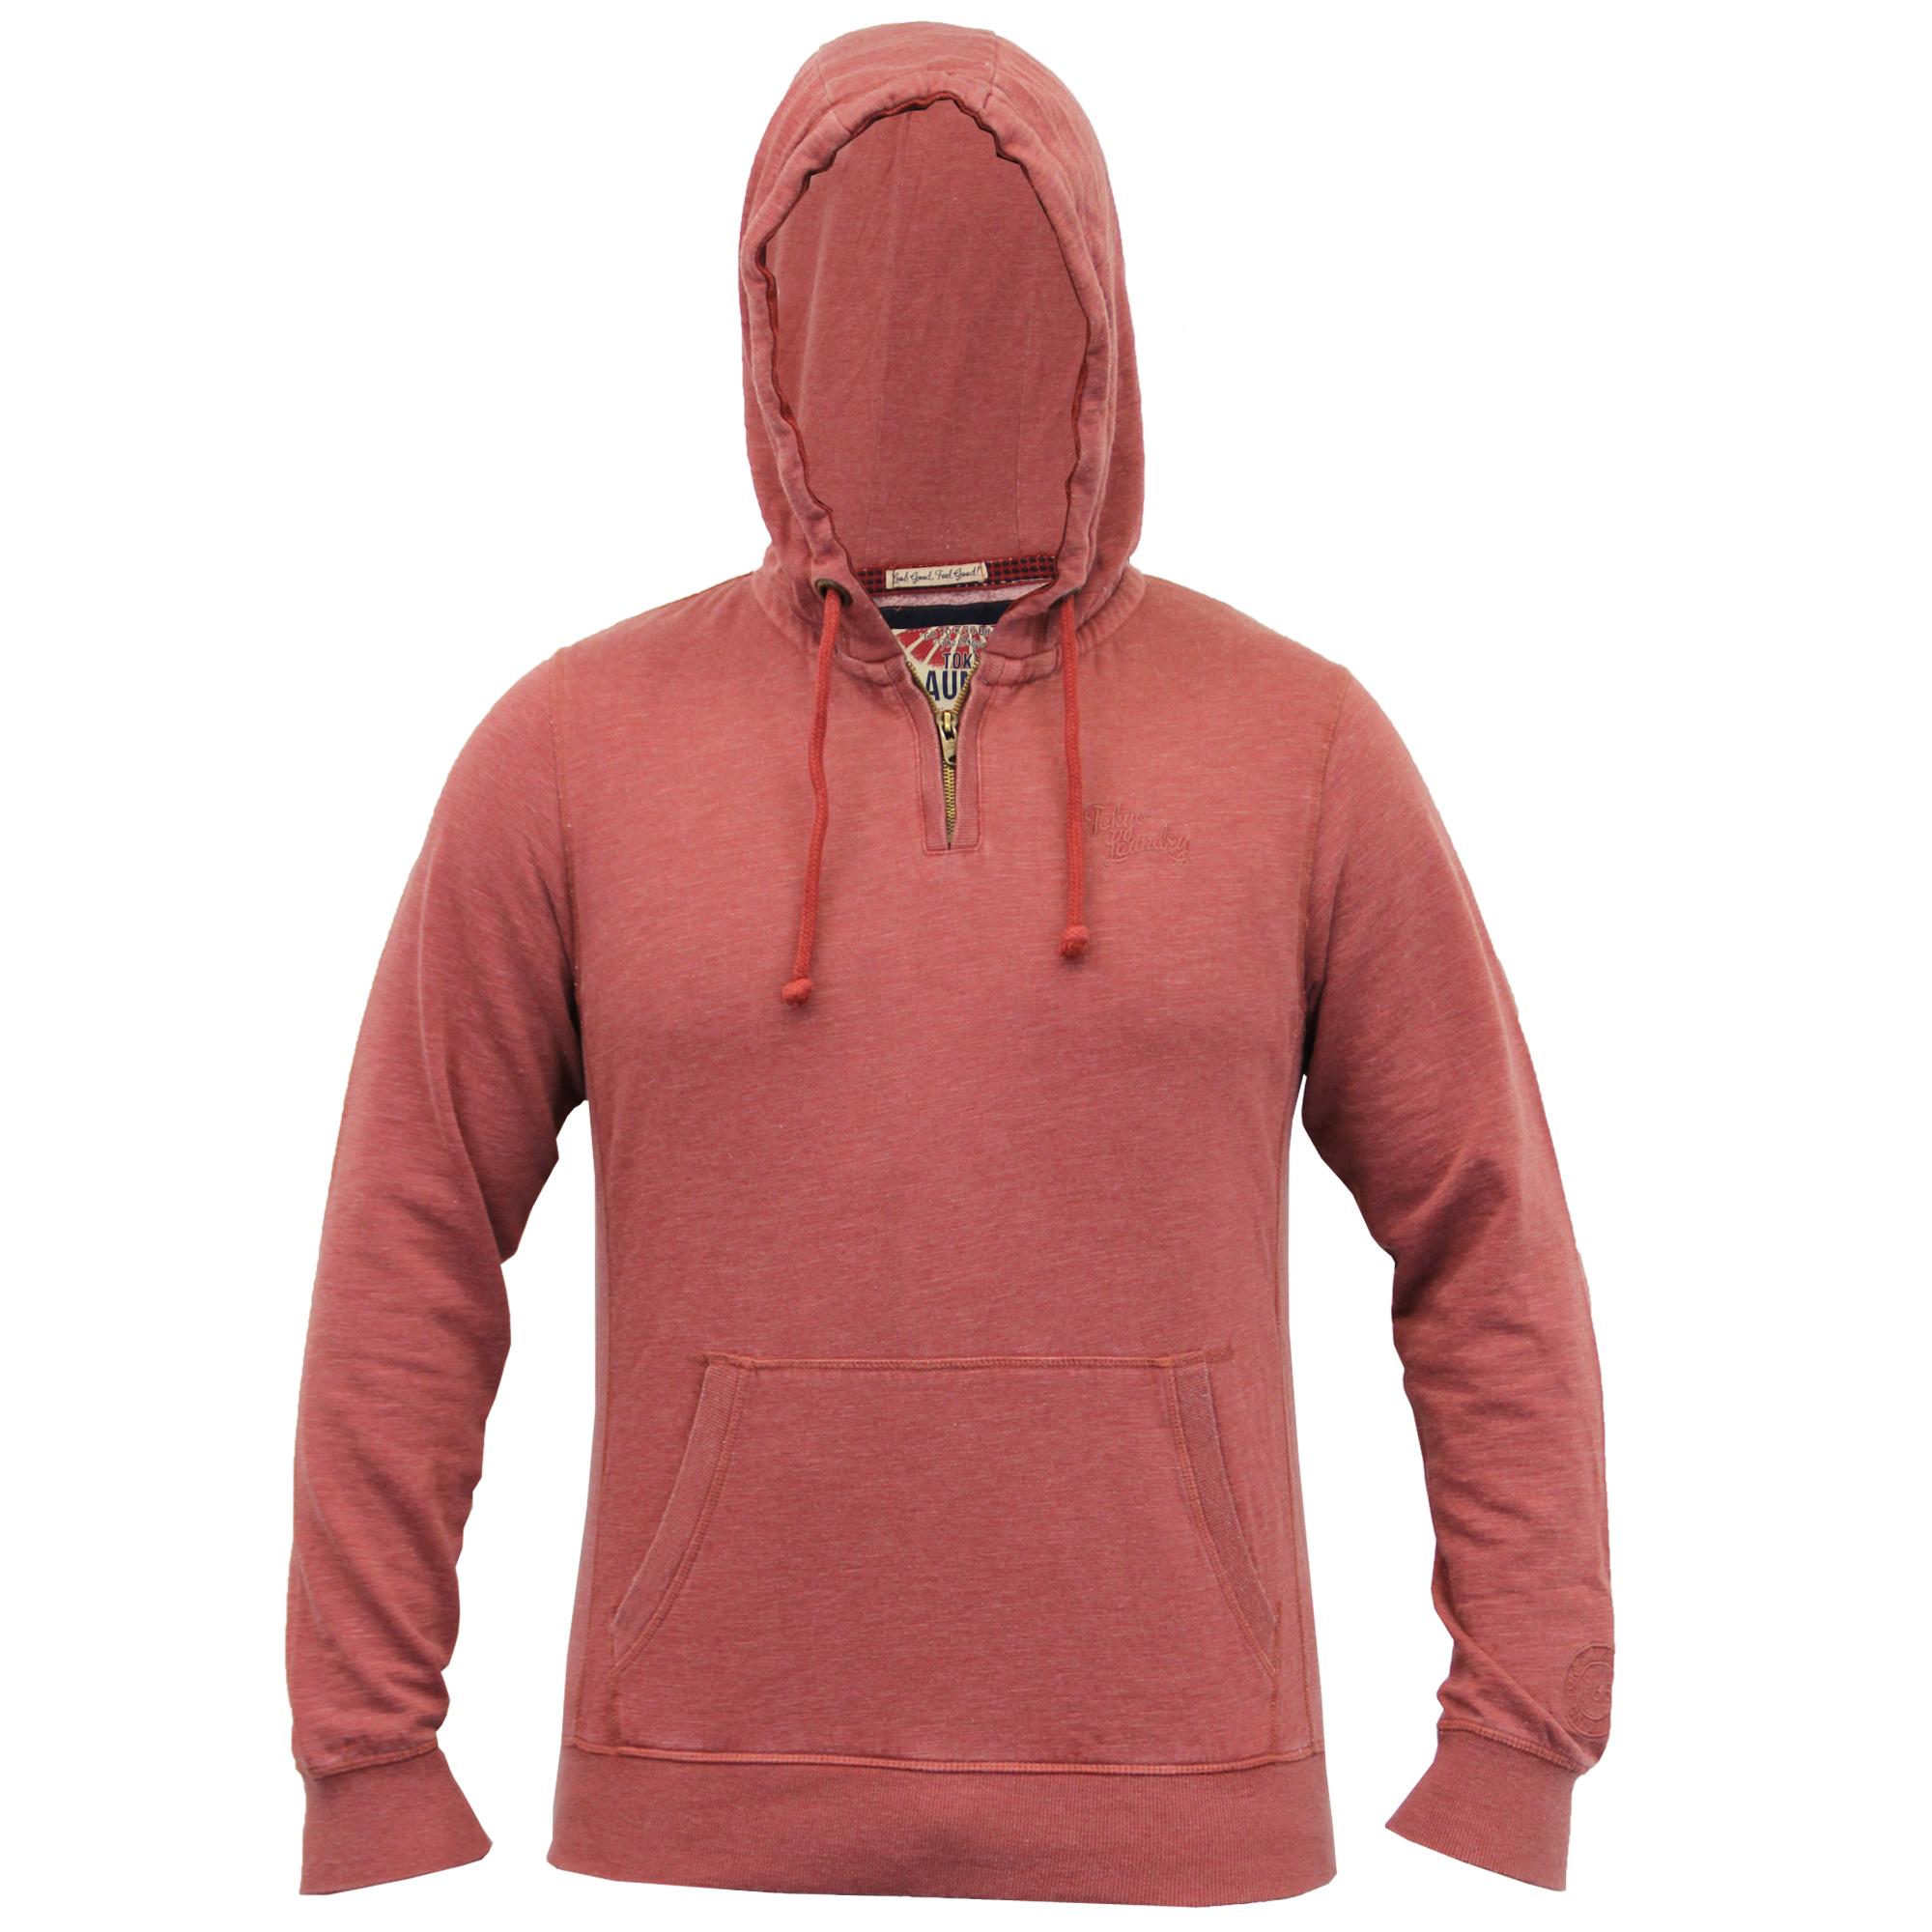 Mens-Sweatshirt-Tokyo-Laundry-Hooded-Top-Sweat-Applique-Zip-Gym-Fleece-Lined-New thumbnail 21